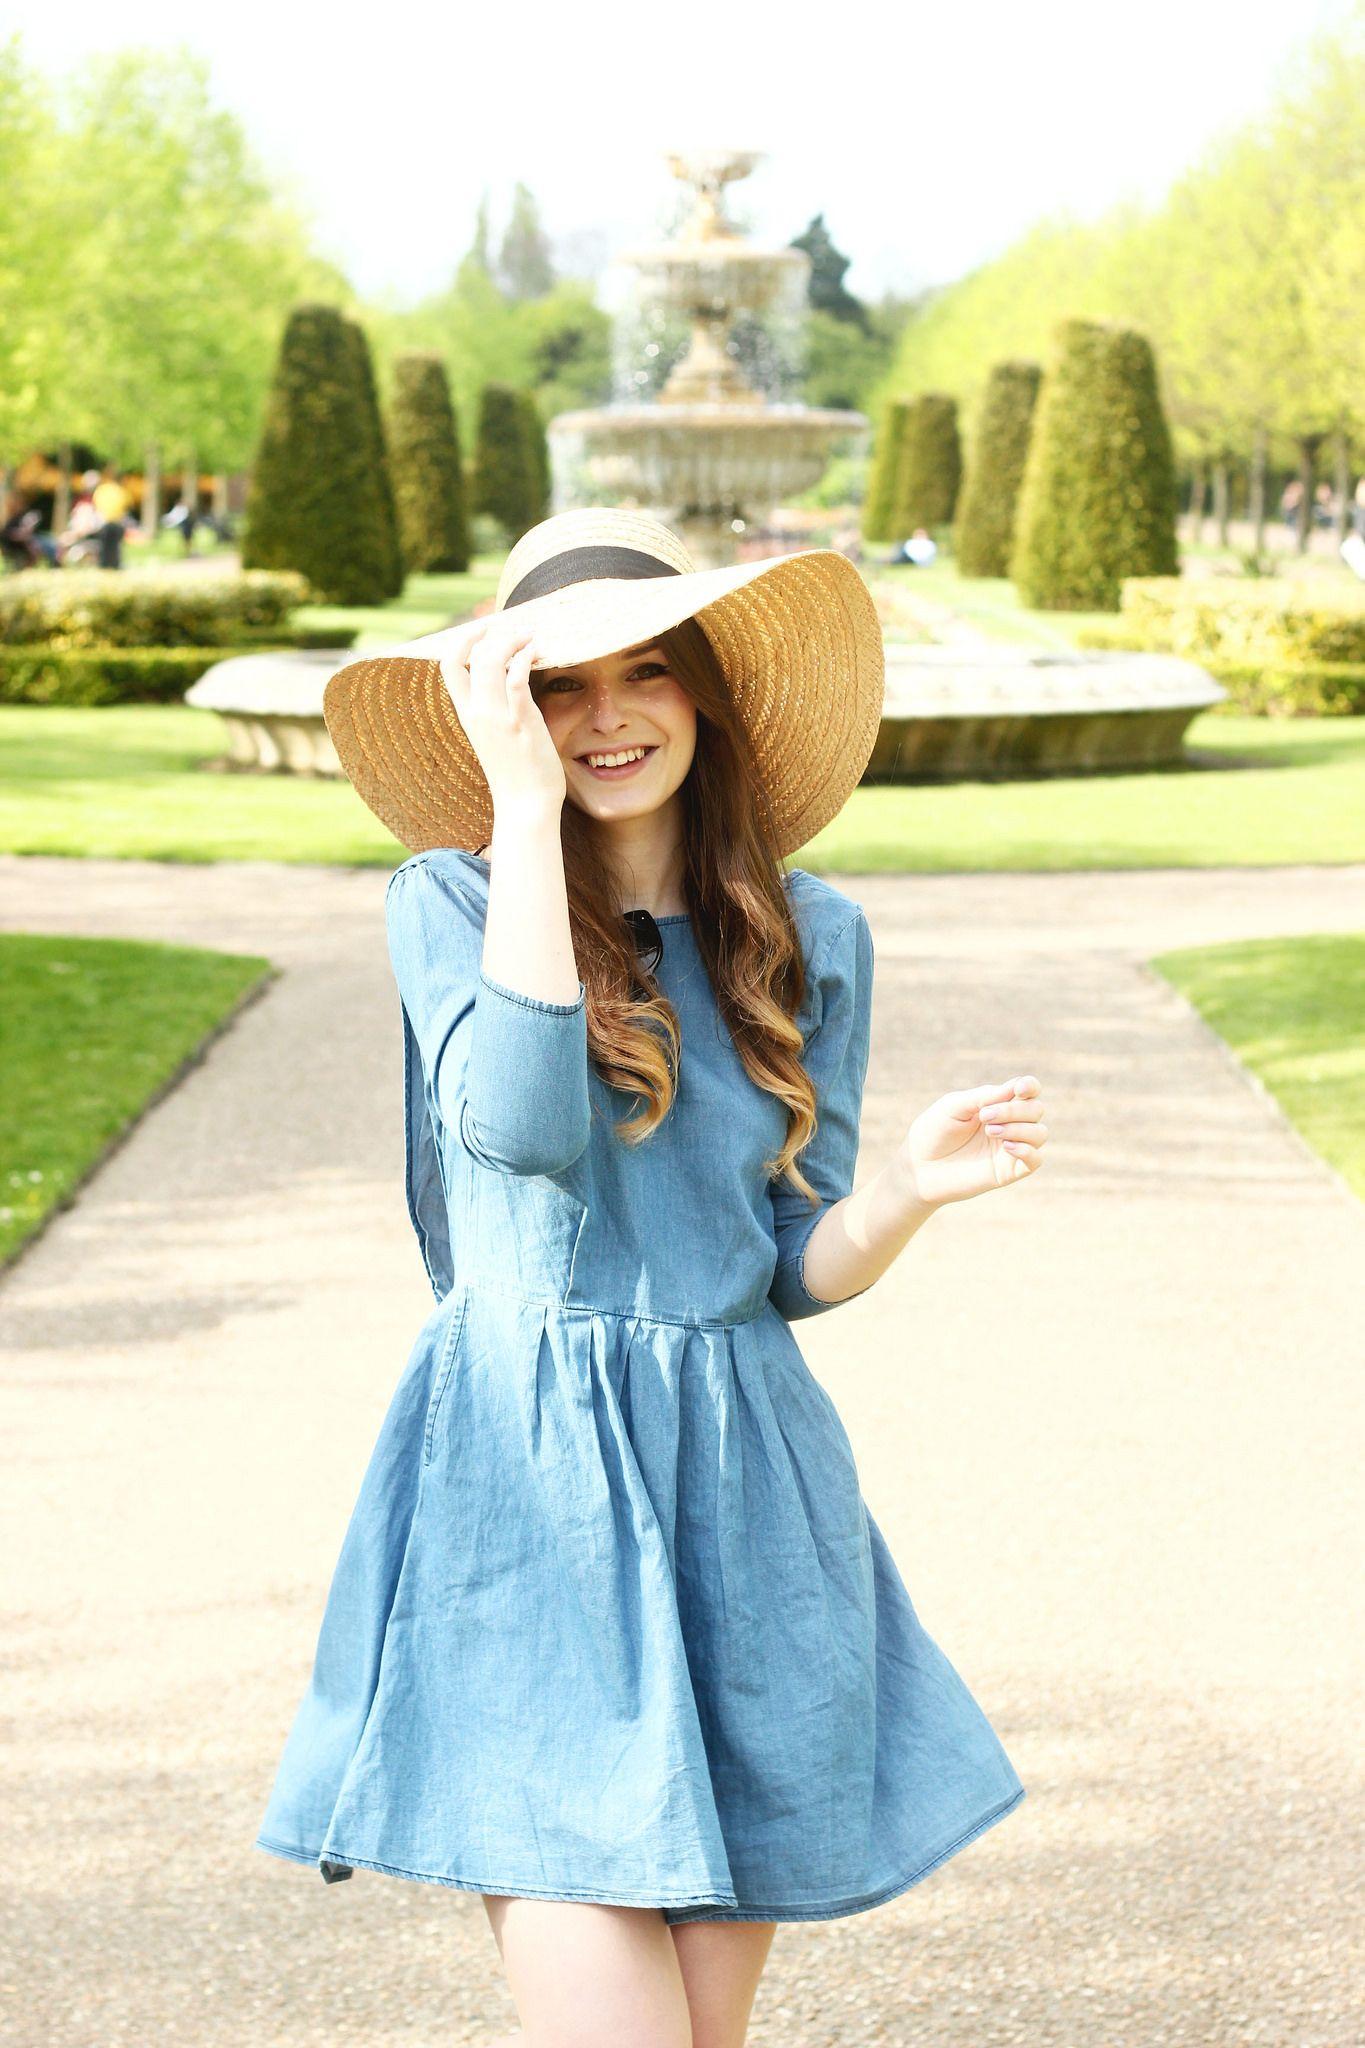 2dcba125ed4960 Spring Denim smock floppy straw hat outfit in 2019   style   Fashion ...